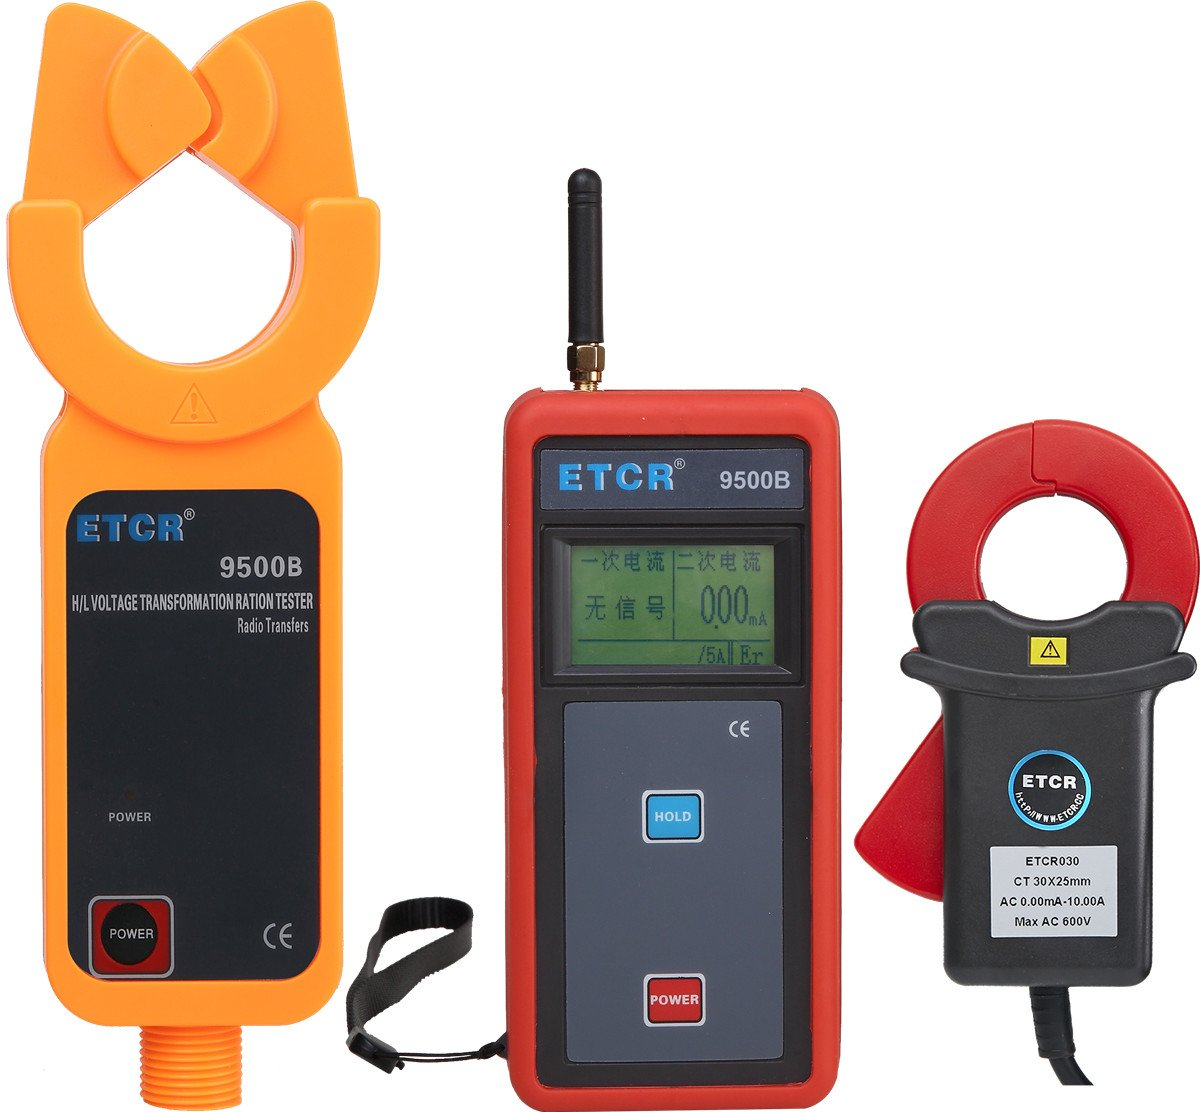 ETCR9500B Wireless High Voltage Current Transformer Ratio Tester